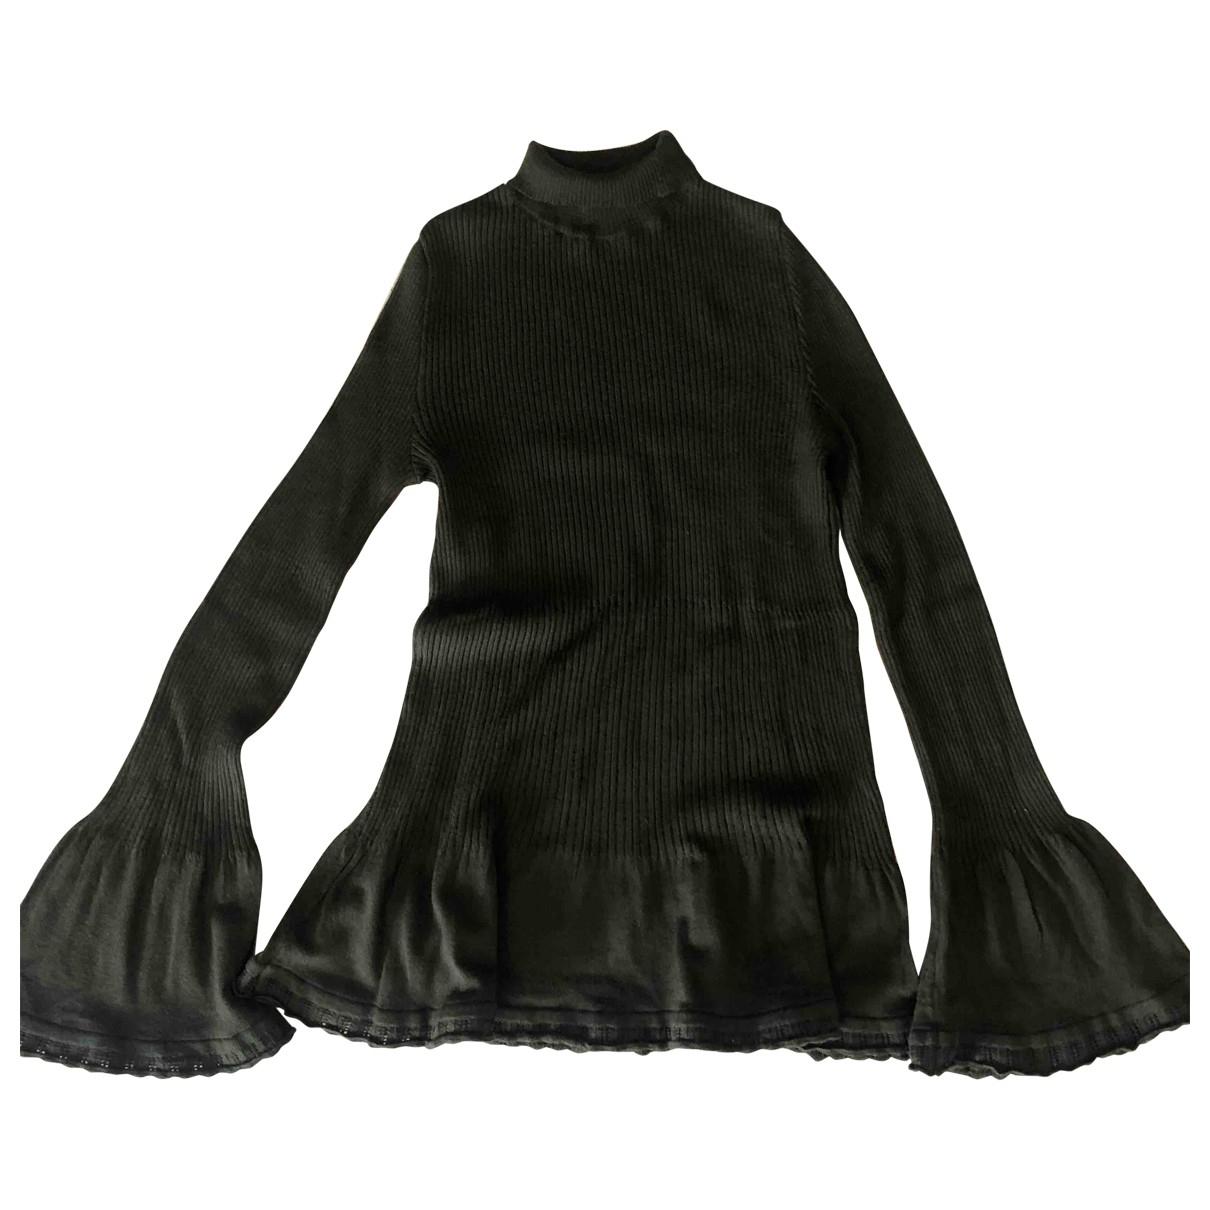 Alberta Ferretti - Top   pour femme en laine - vert